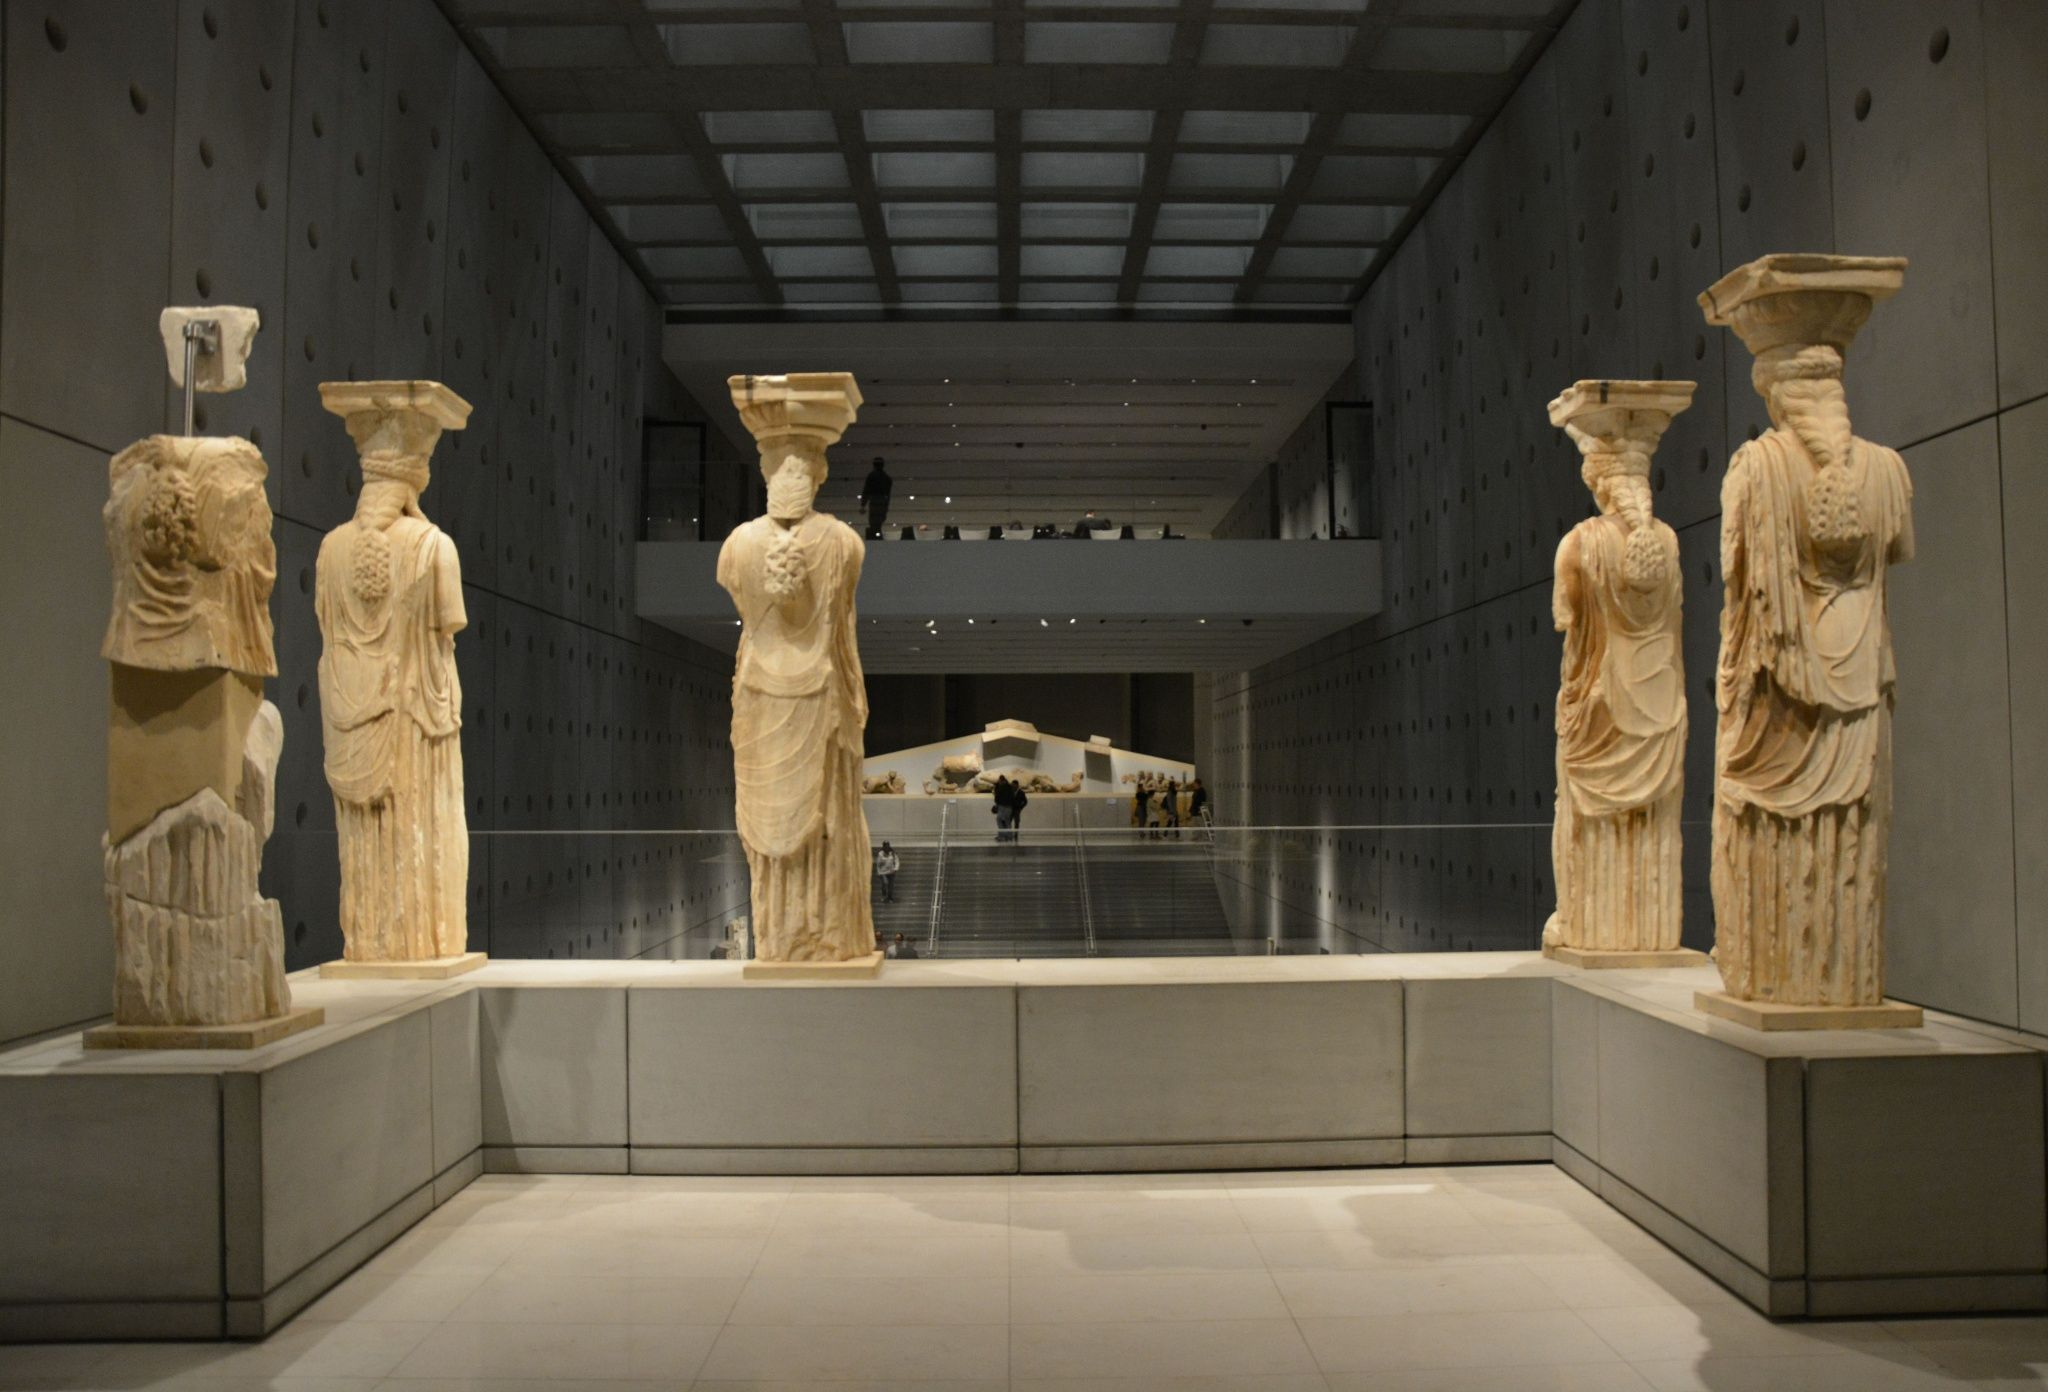 Korai Pathenon Decoration Archaic Kore Of Acropolis Museum Reproduction